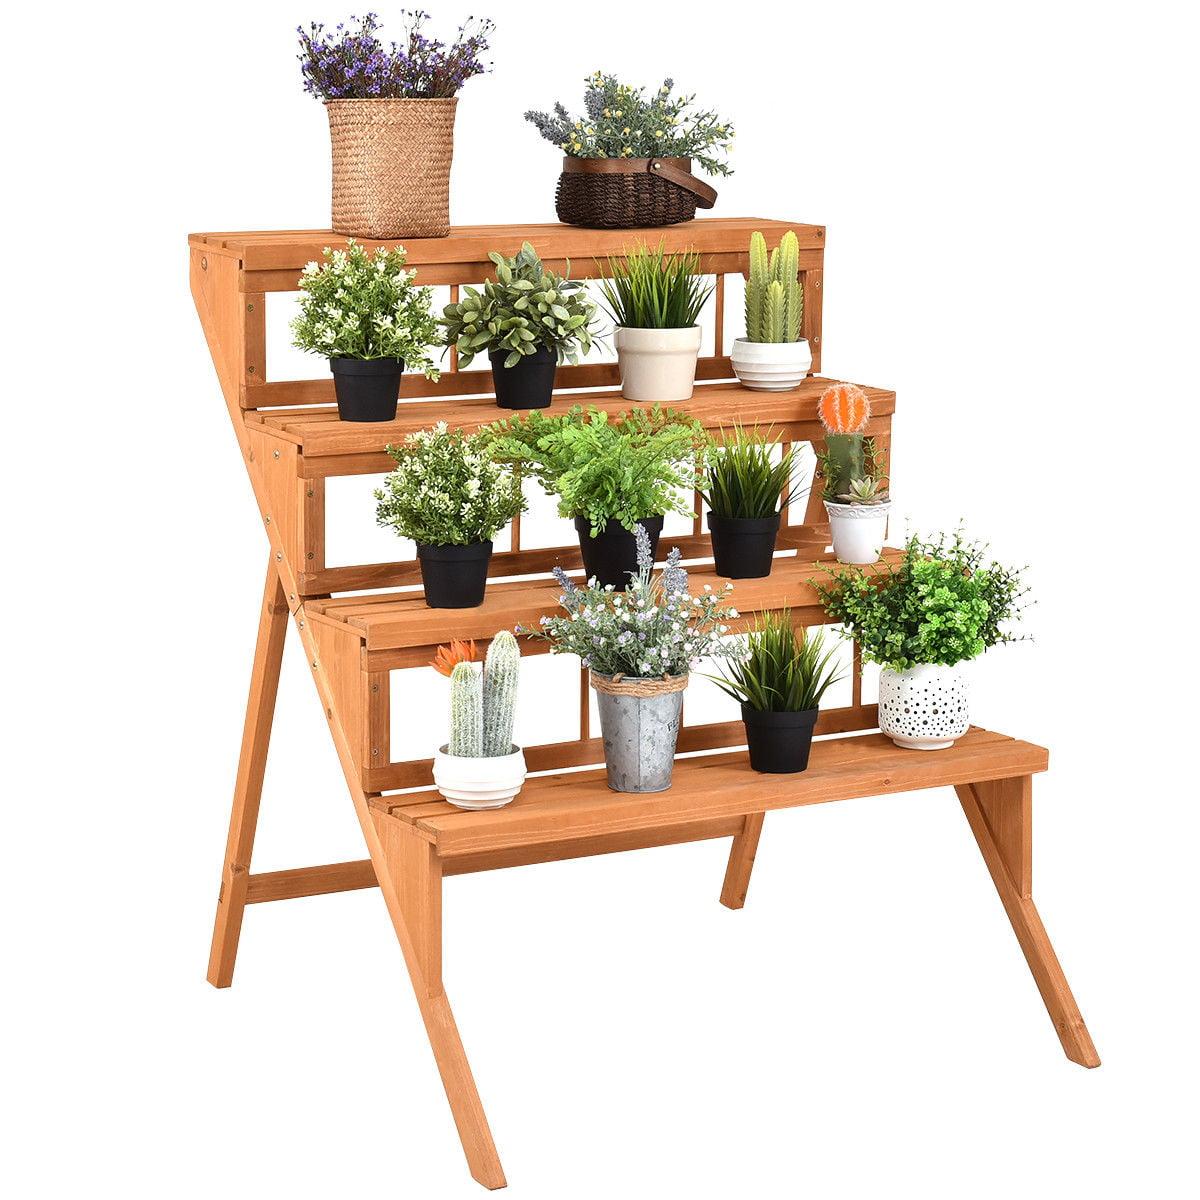 Costway 4 Tier Wood Plant Stand Flower Pot Holder Display Shelves